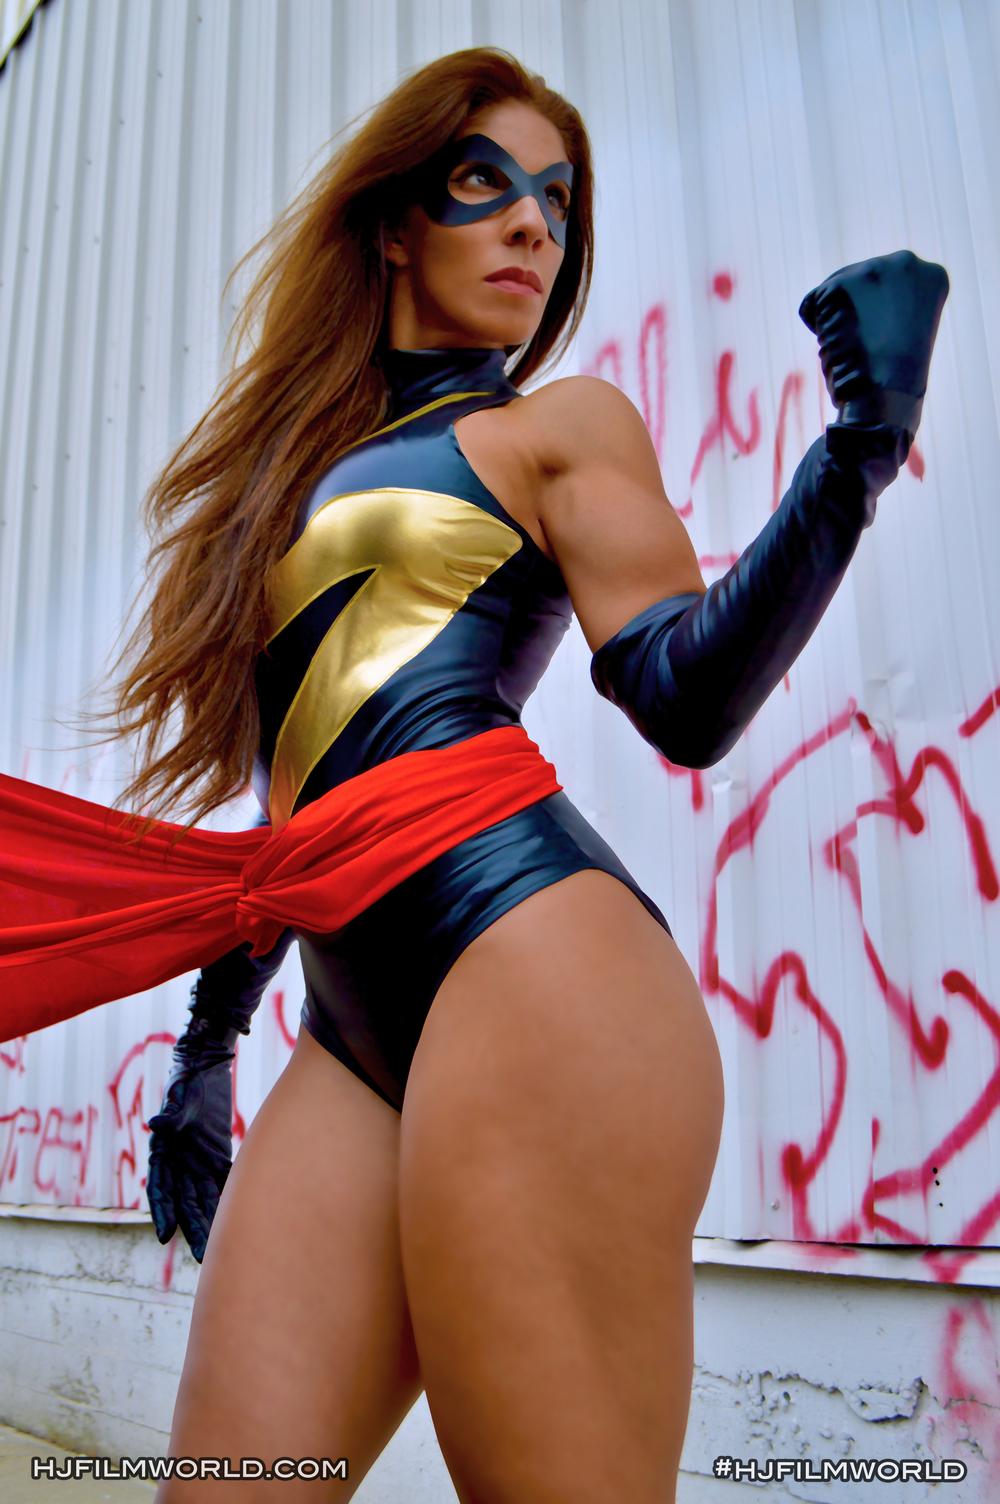 Model: Sonia Rodriguez